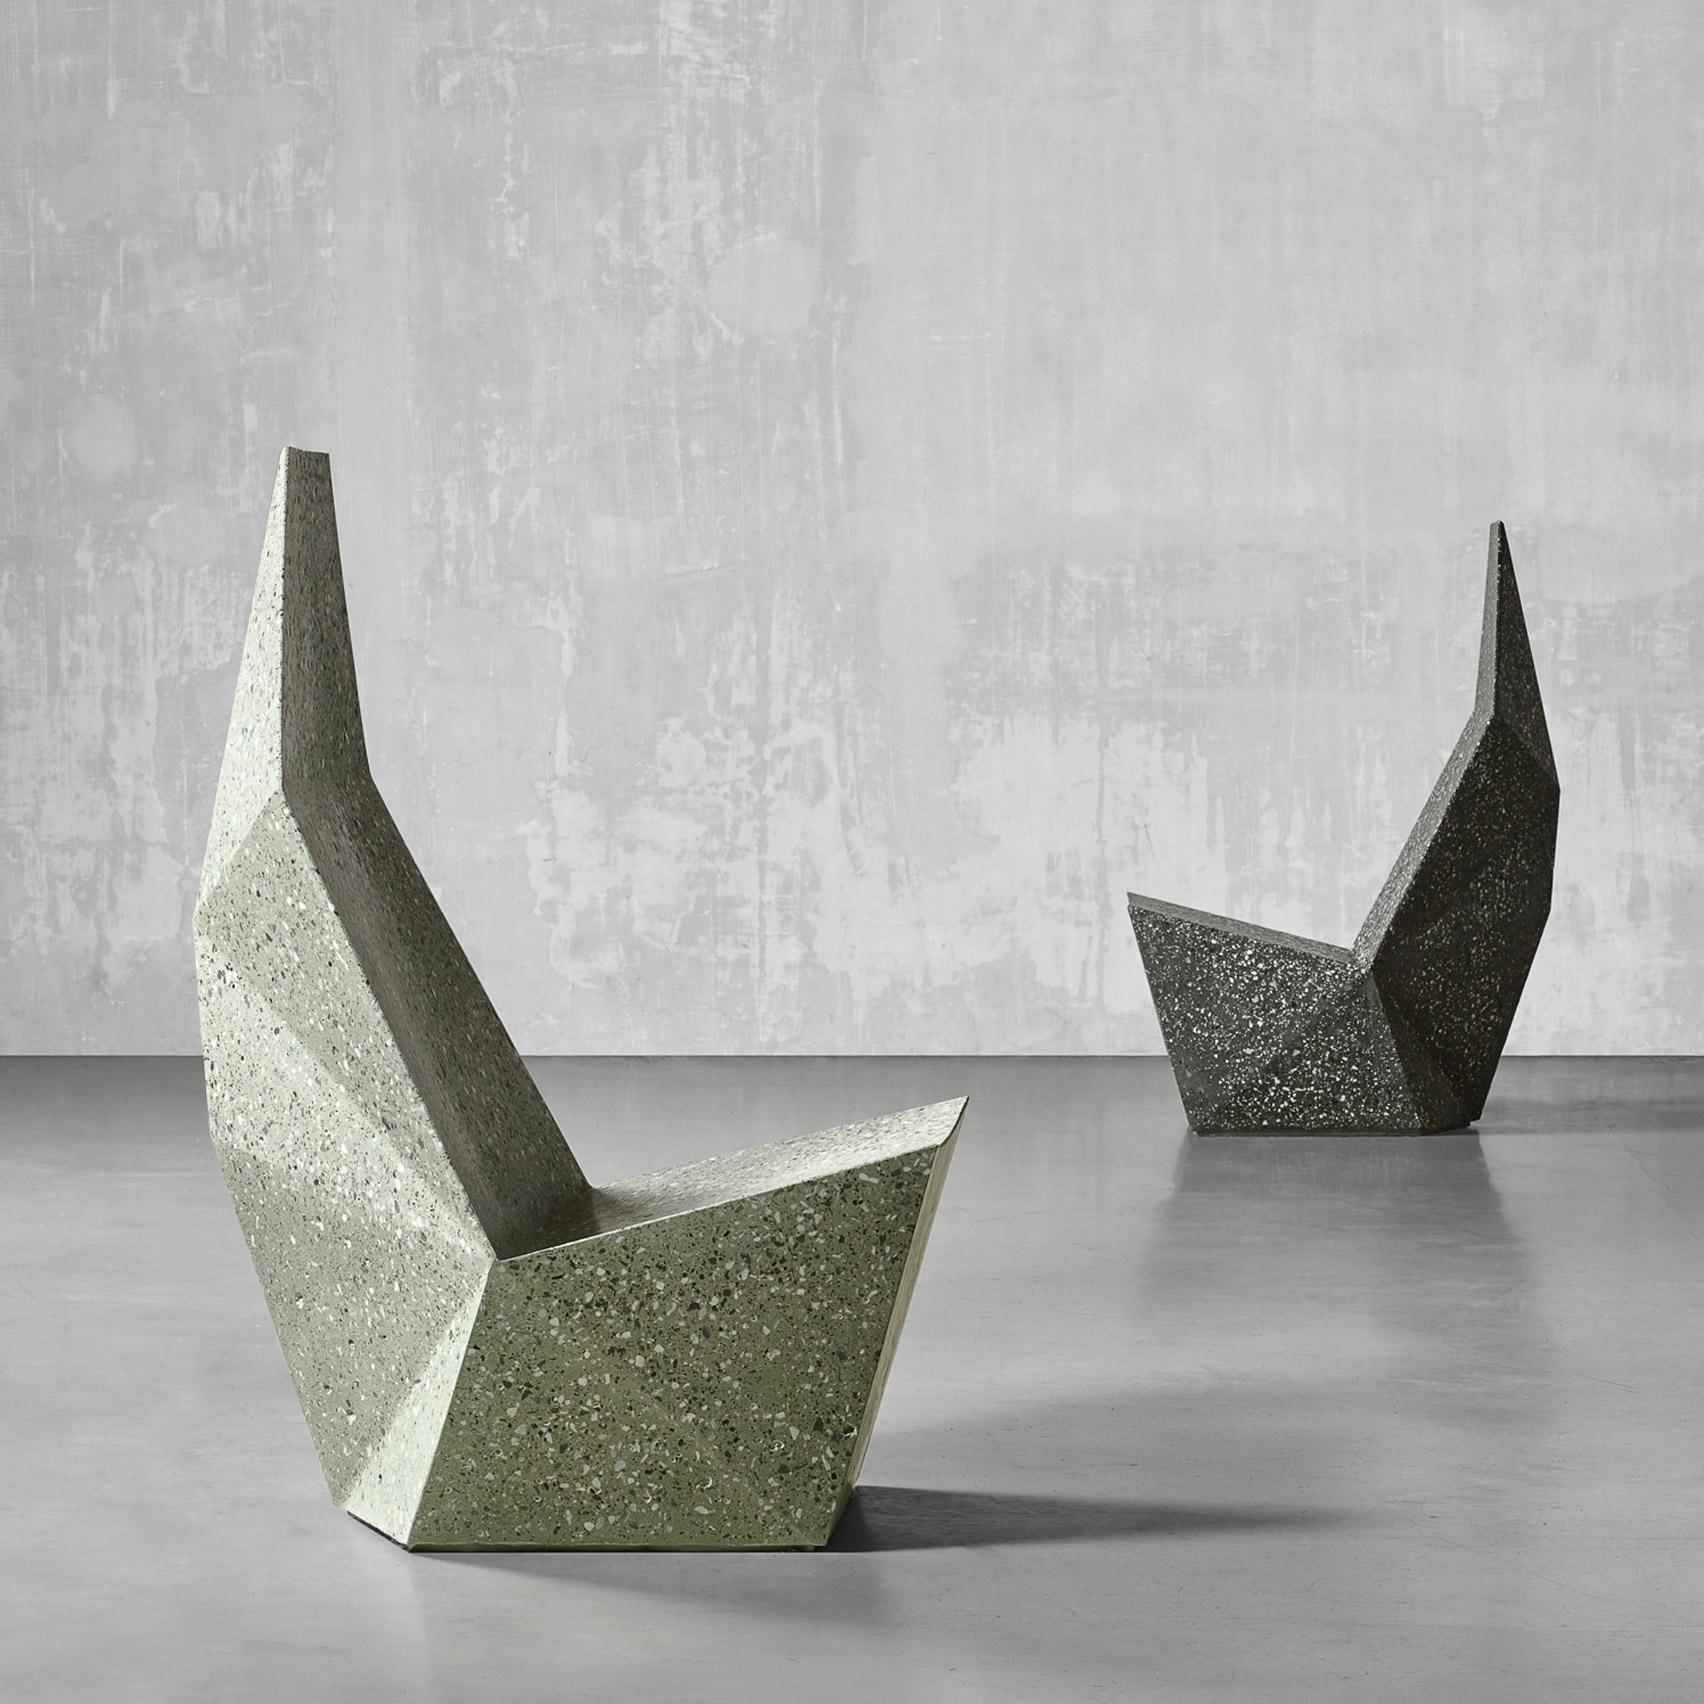 QTZ Concrete by Ivanka